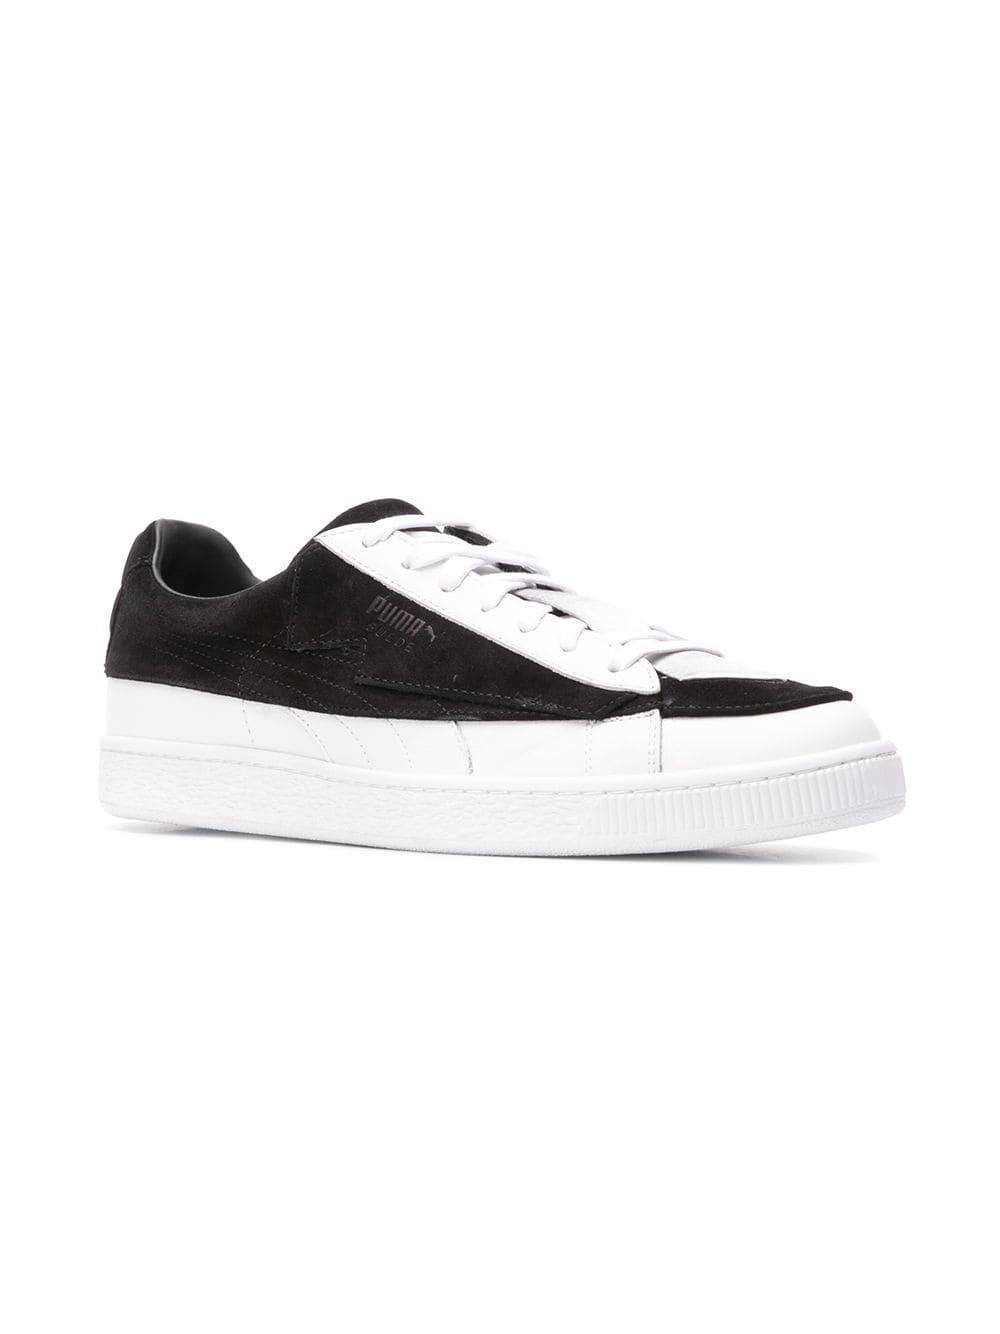 a7ce09883d53 Lyst - Karl Lagerfeld X Puma Tie Sneakers in Black